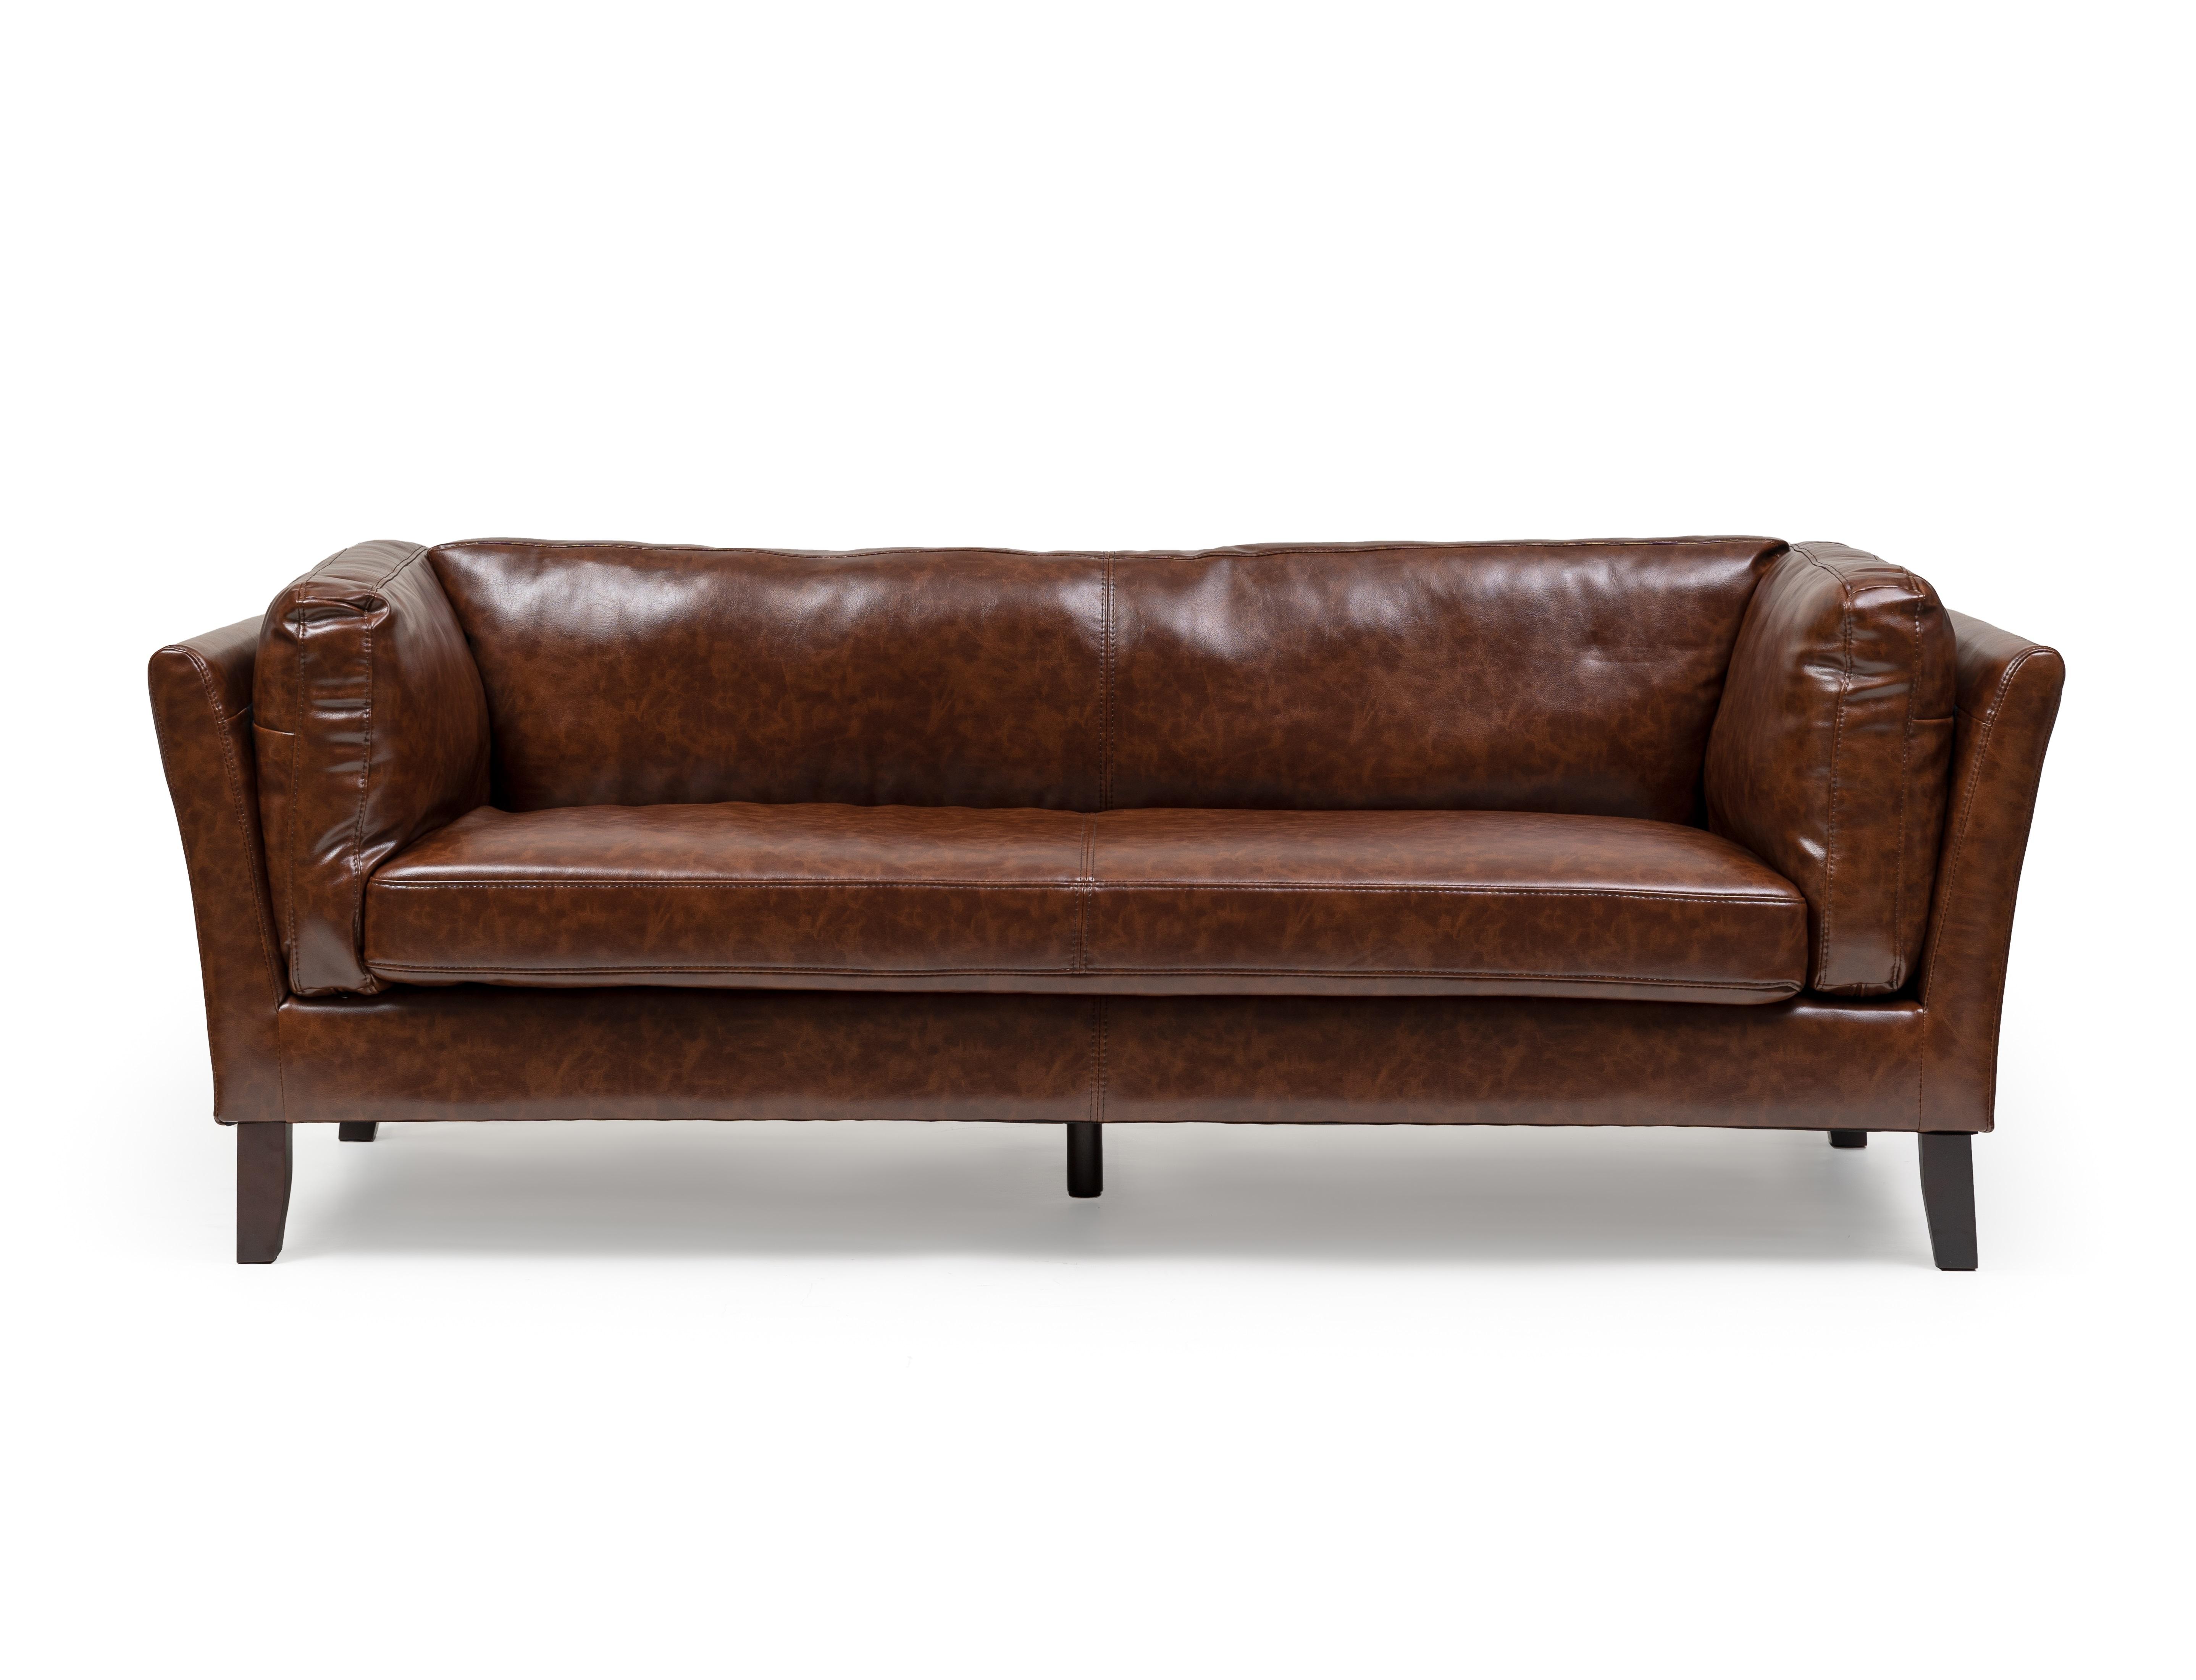 Kelly lounge диван kelly в коричневом цвете коричневый 143686/143698